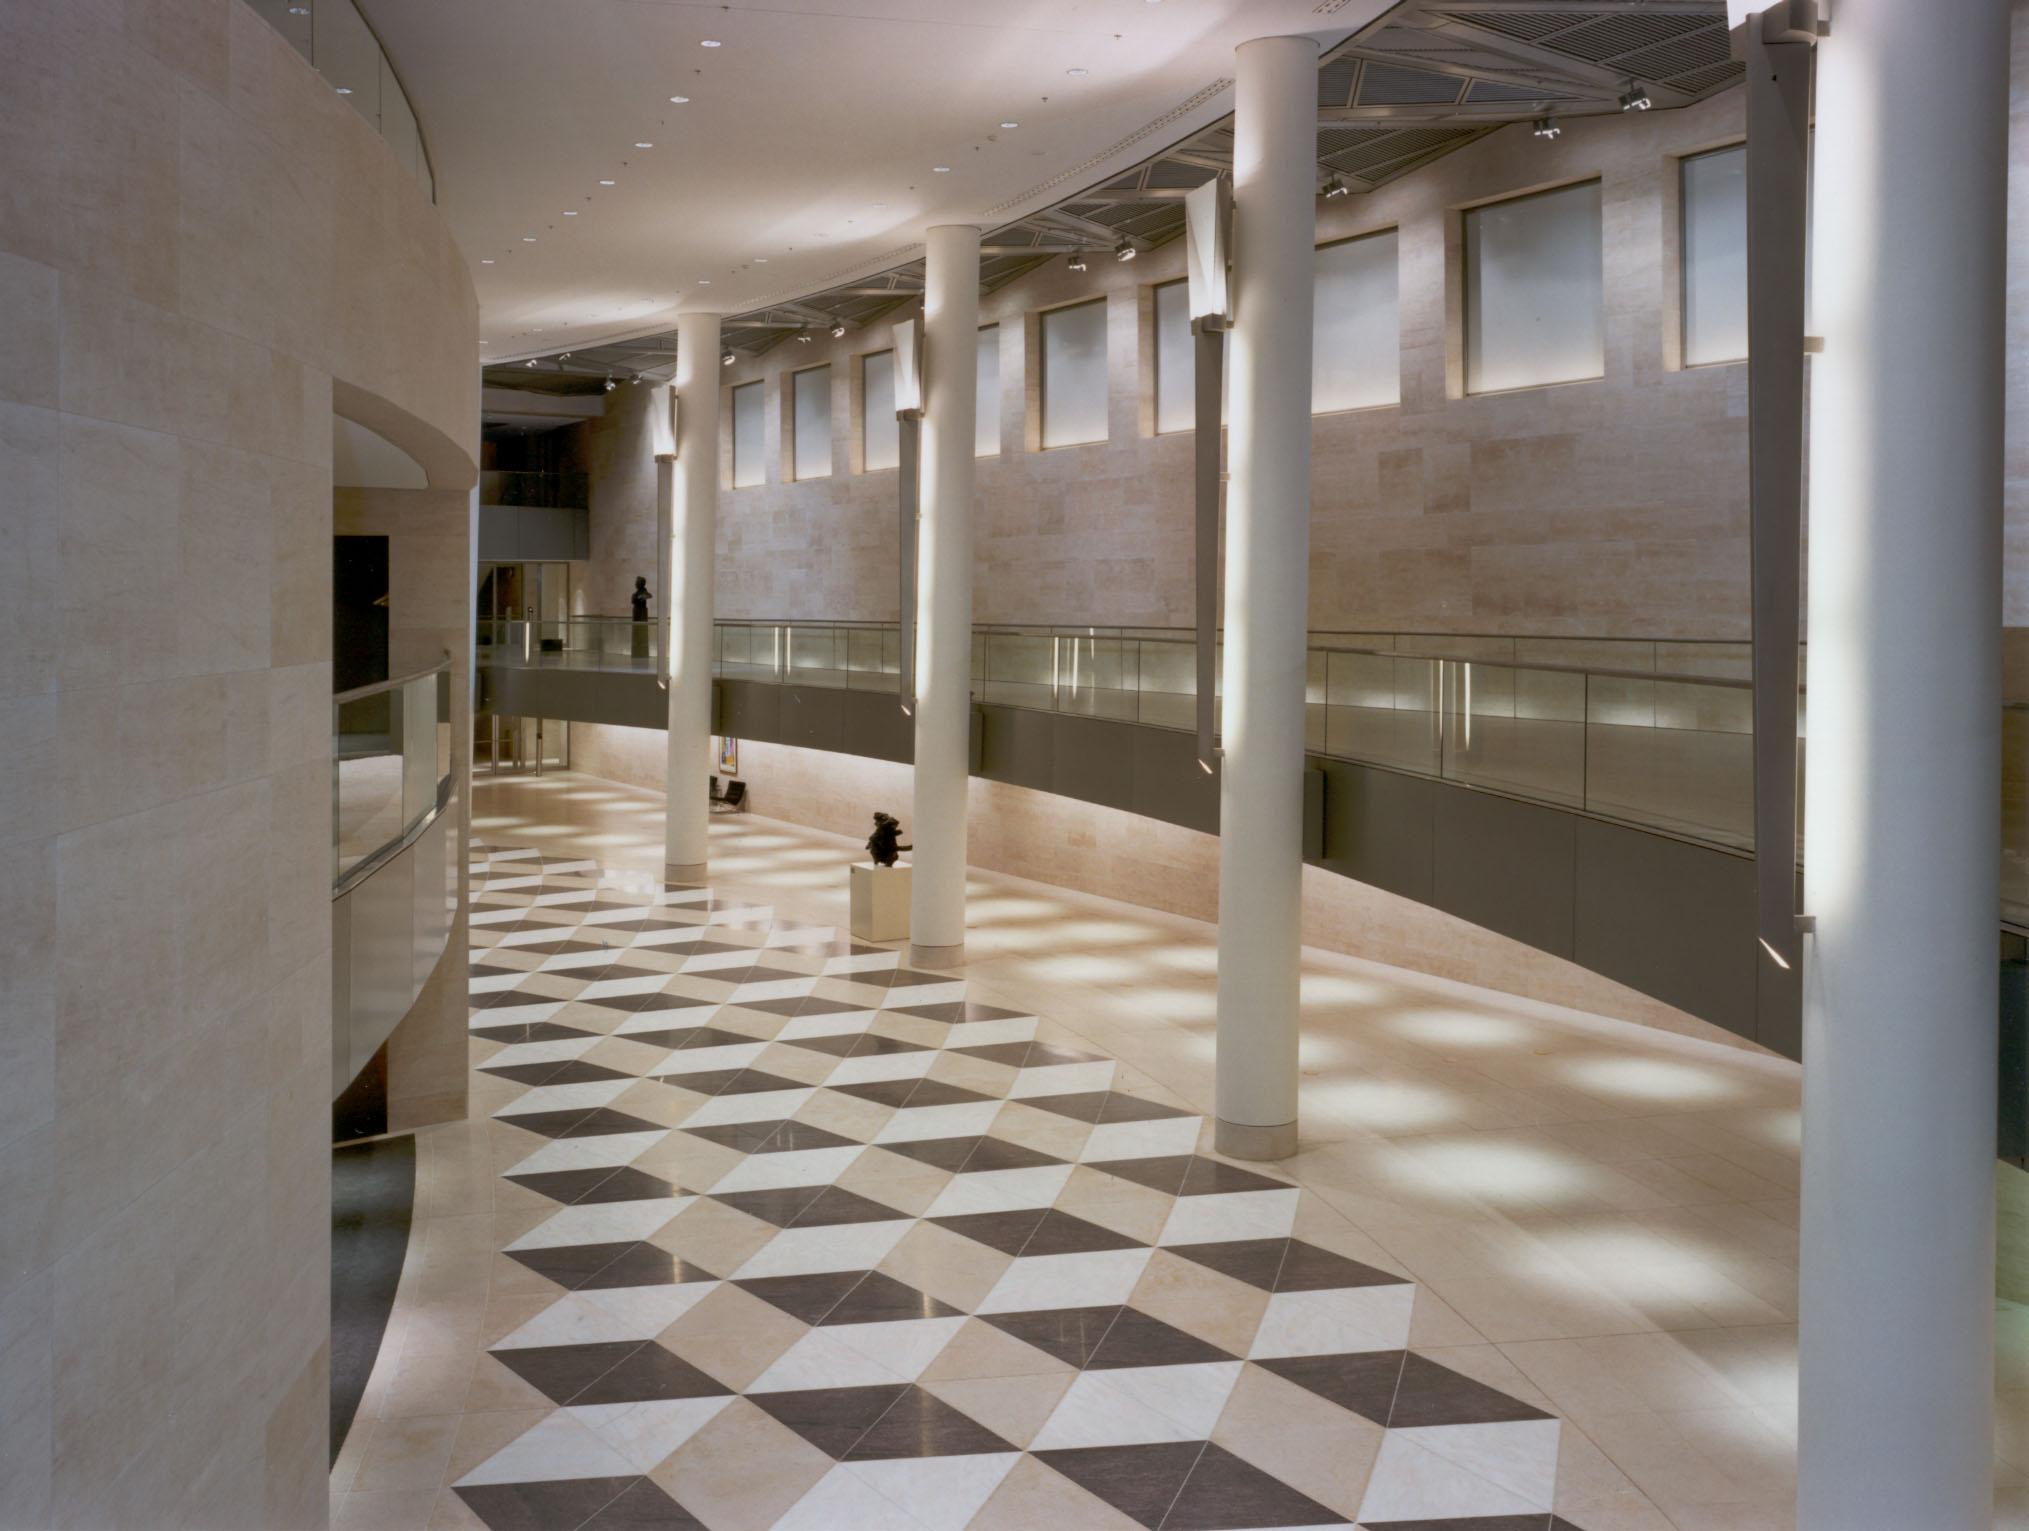 stylish floor netherlands setp armo ruoms poiseul amsterdam 2005